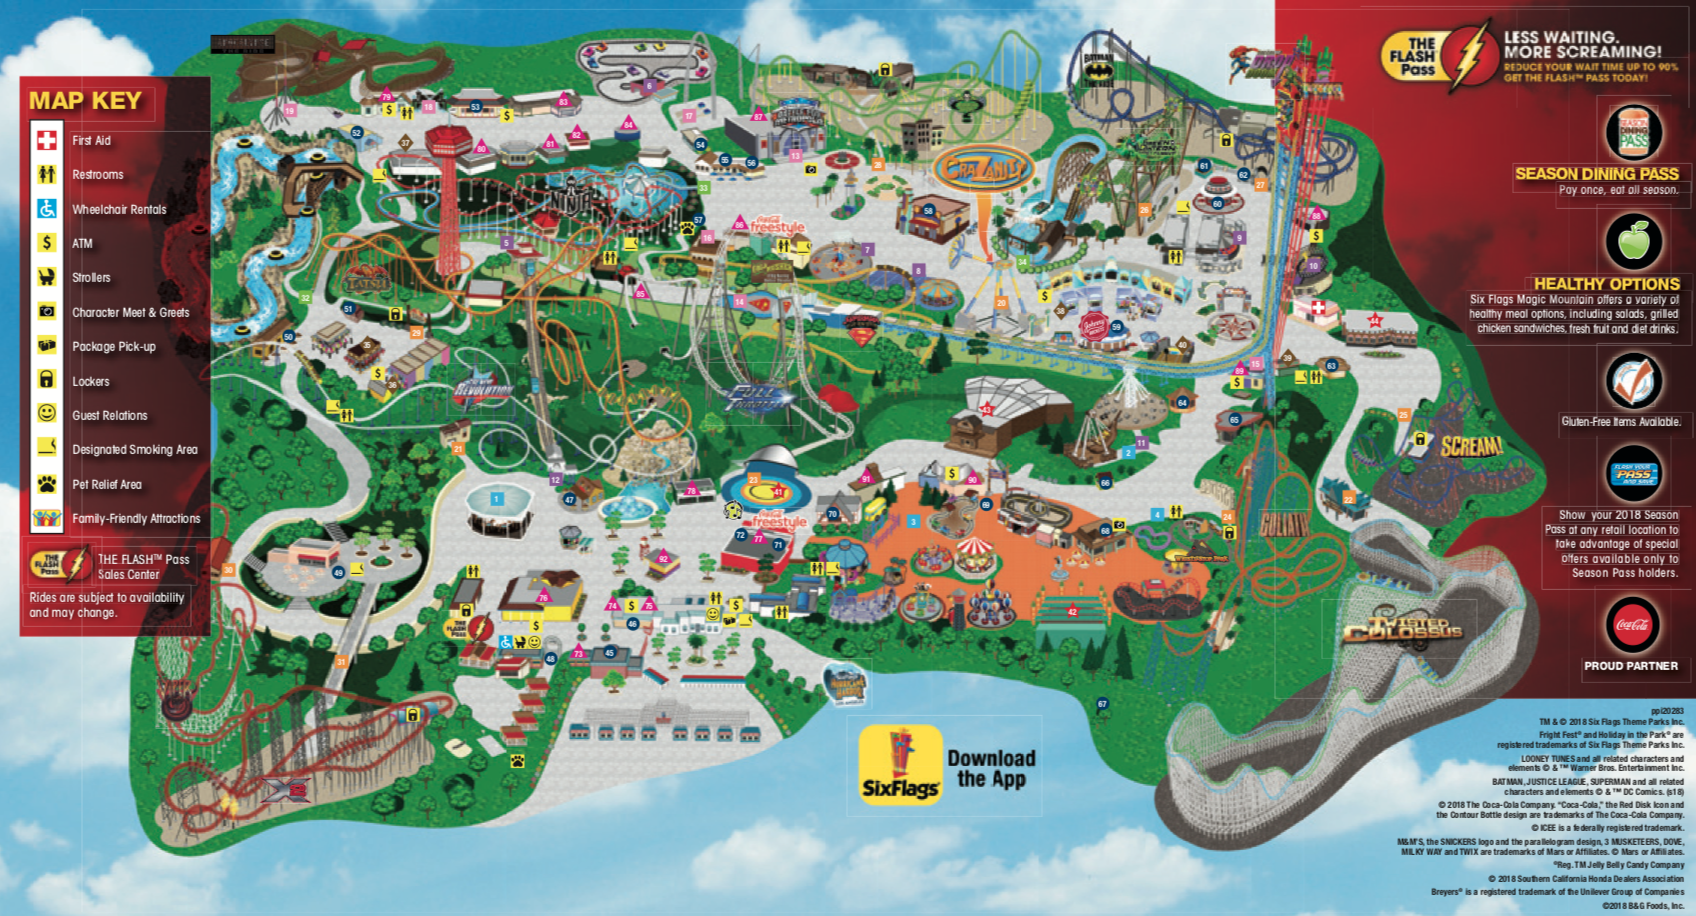 Hersheypark's PARK MAP, ALL CREDIT TO Hersheypark